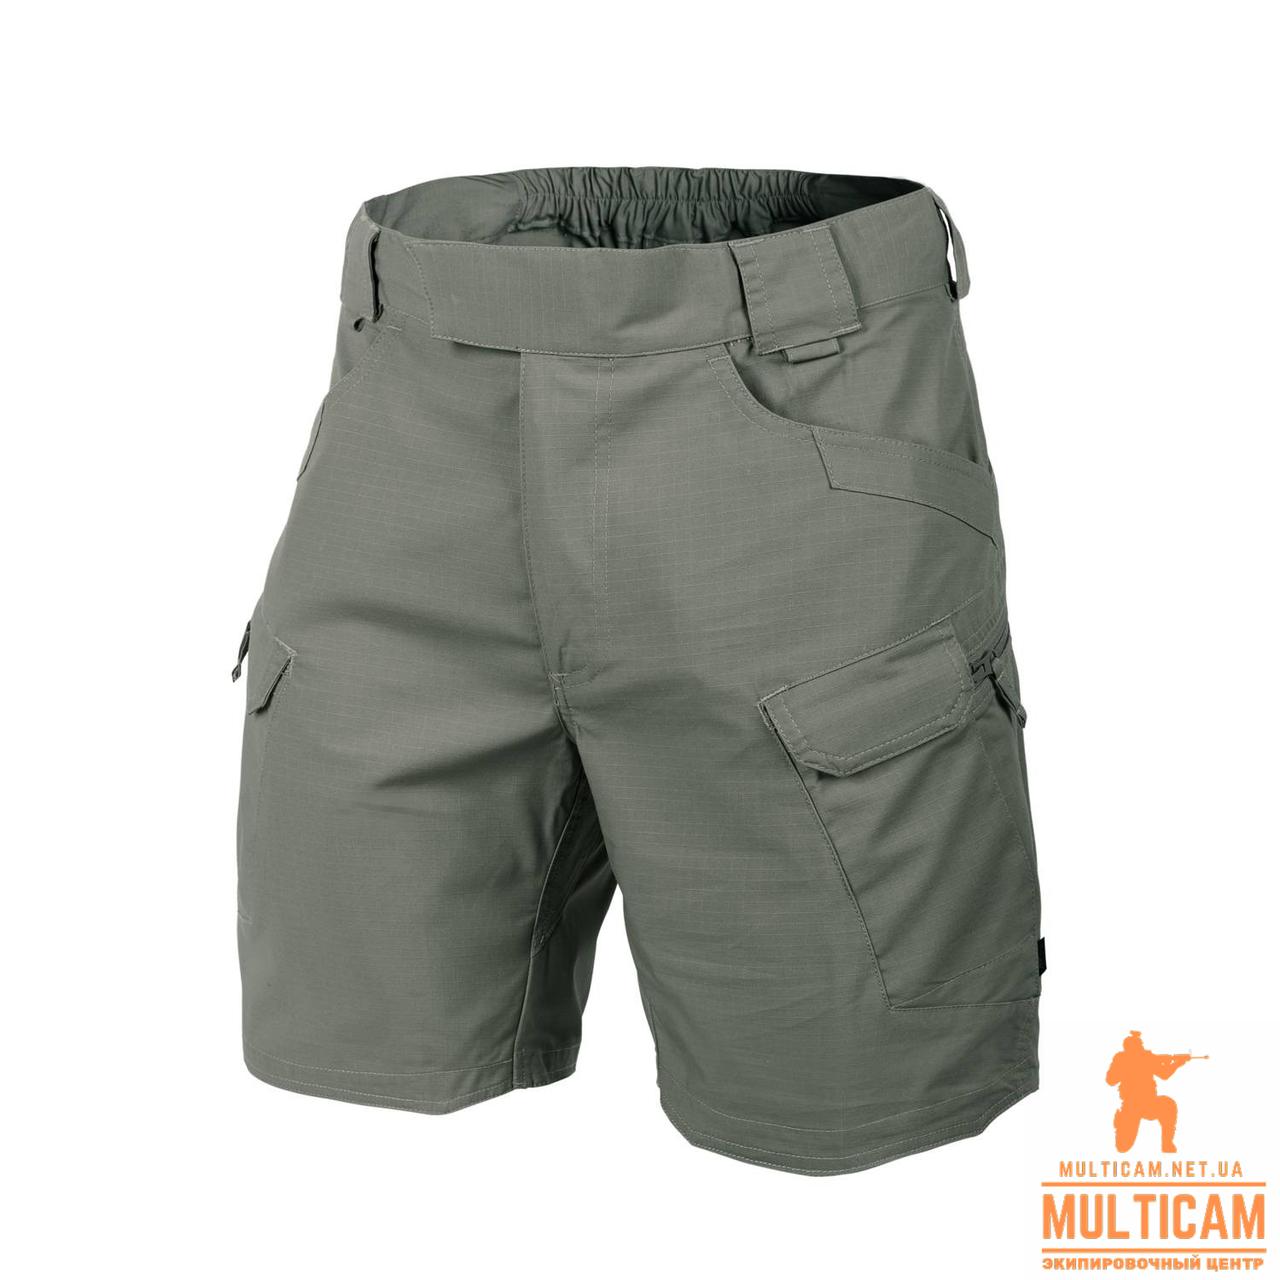 "Шорты Helikon-Tex® UTS (Urban Shorts®) 8.5""® - PolyCotton Ripstop - Olive Drab"